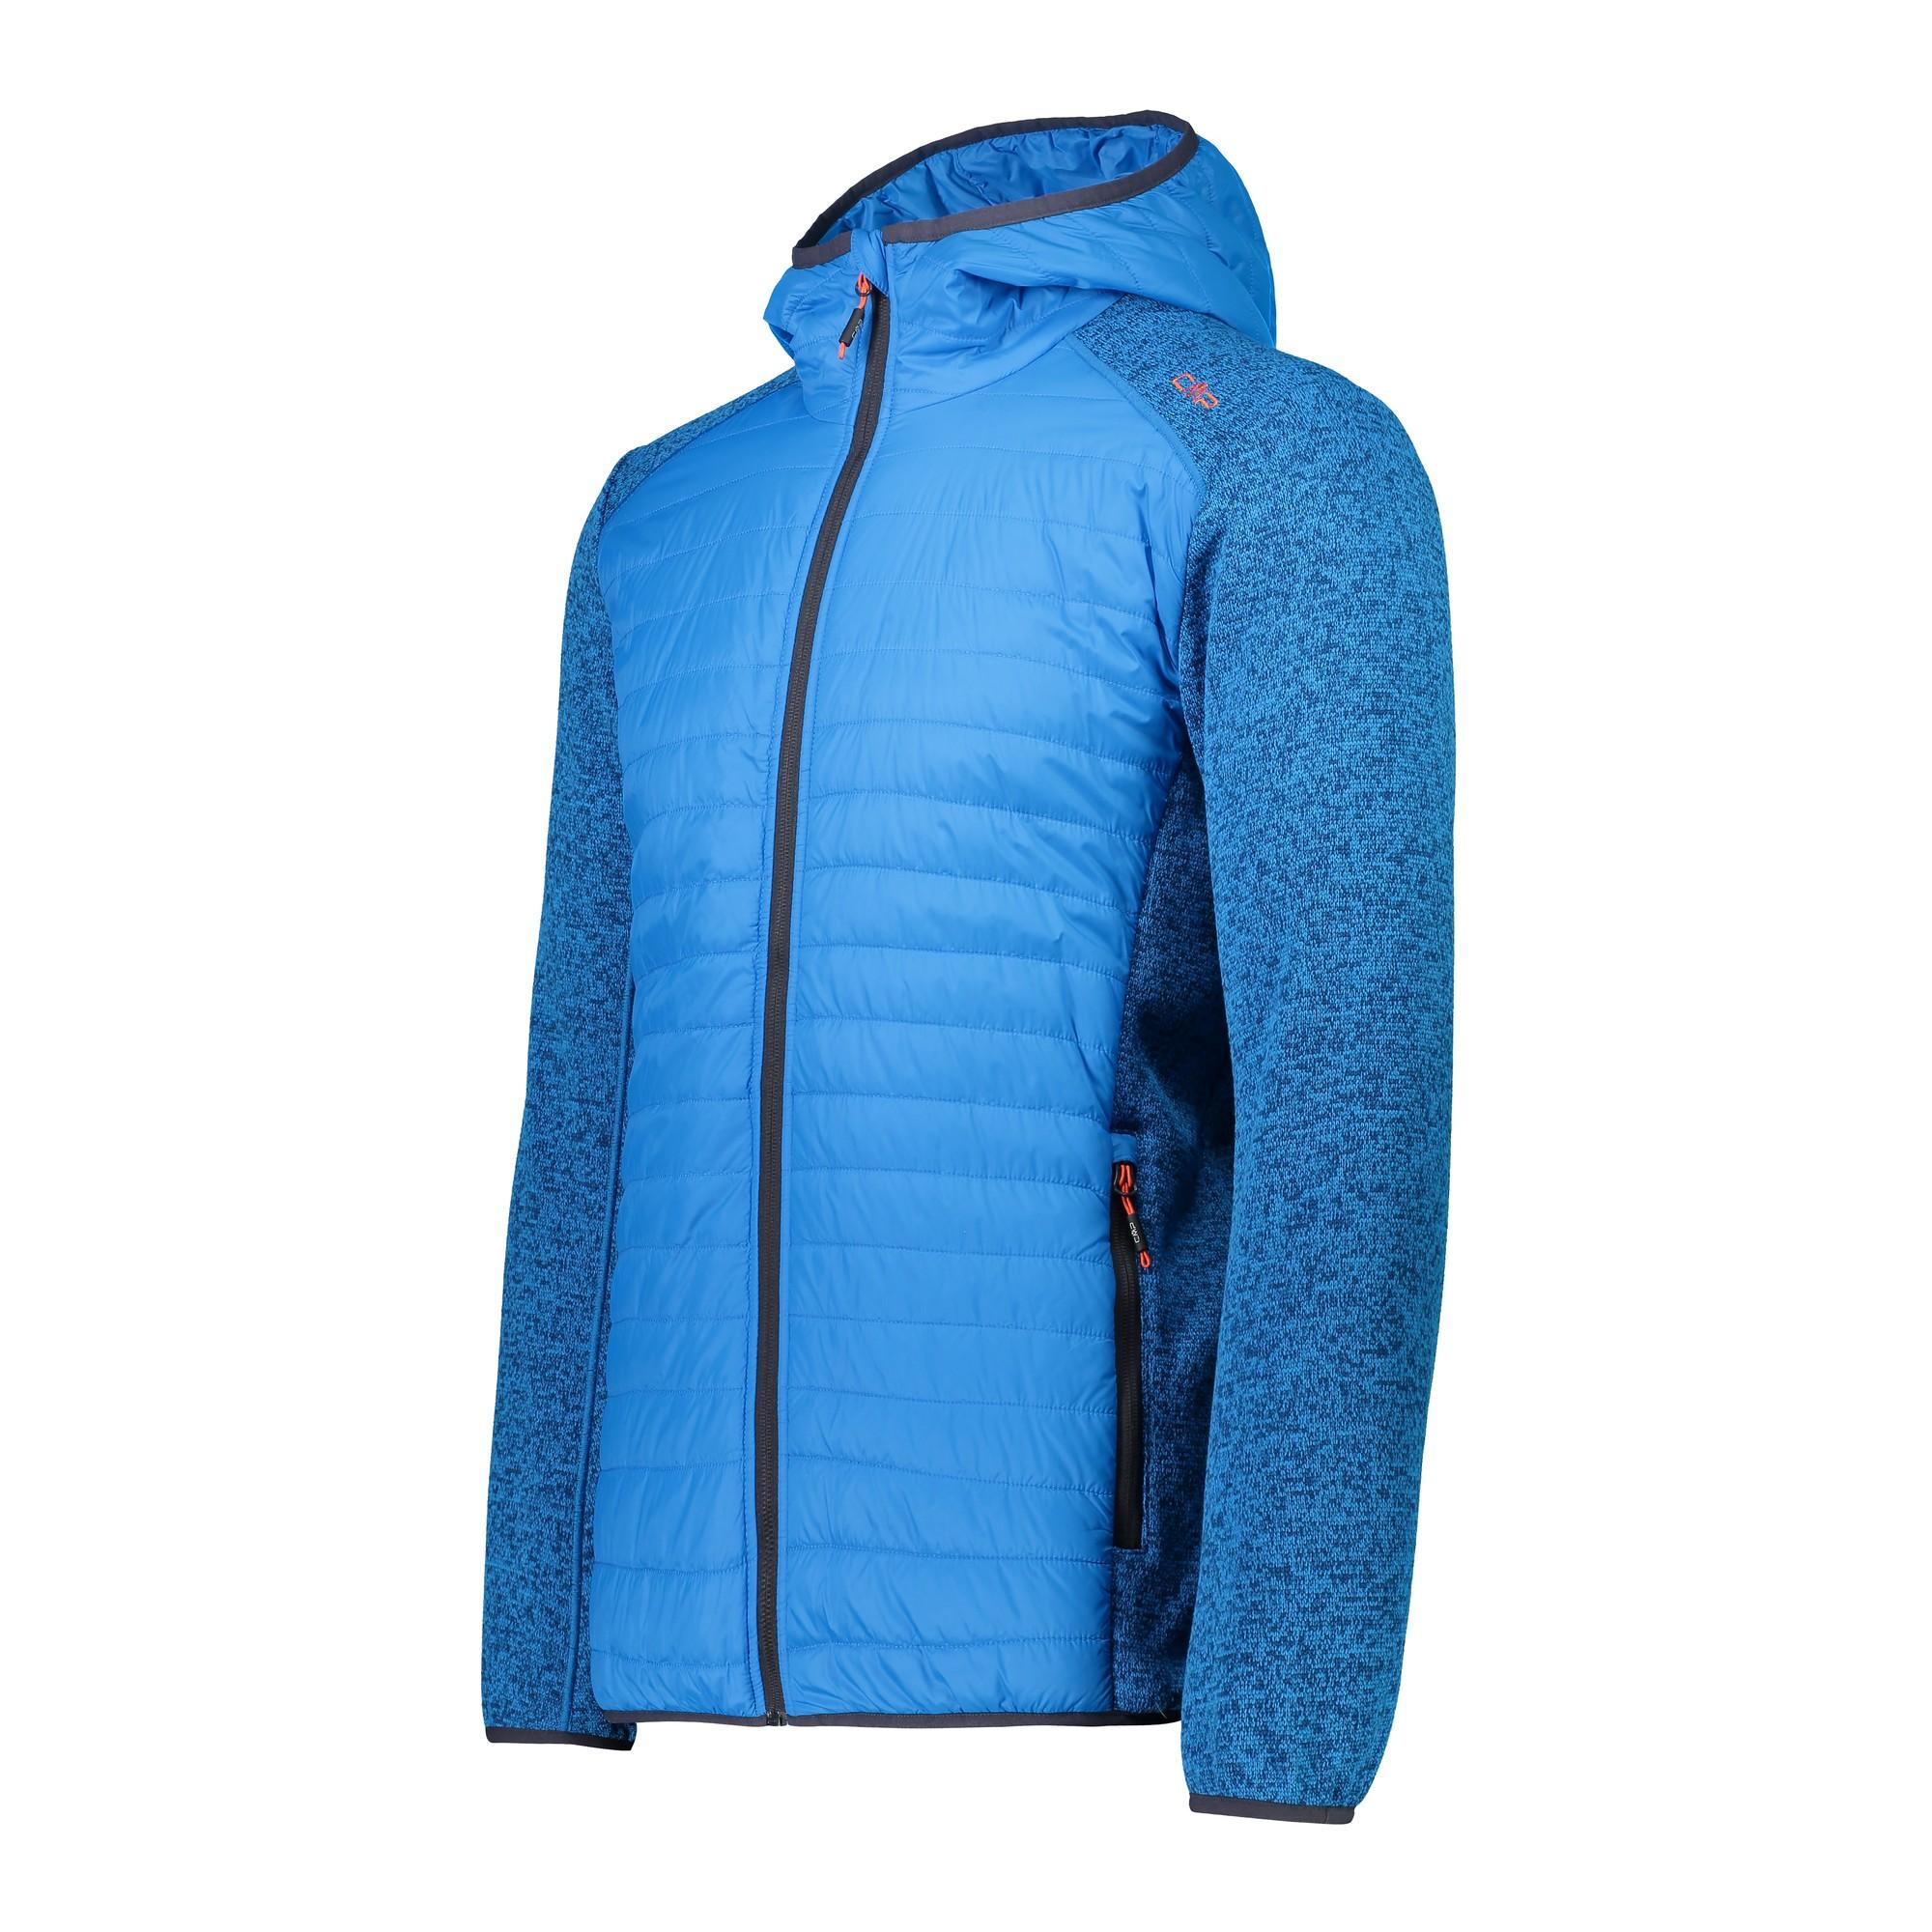 Details about CMP Hybridjacke Jacket Man Jacket Fix Hood Hybrid Blau Breathable Warming